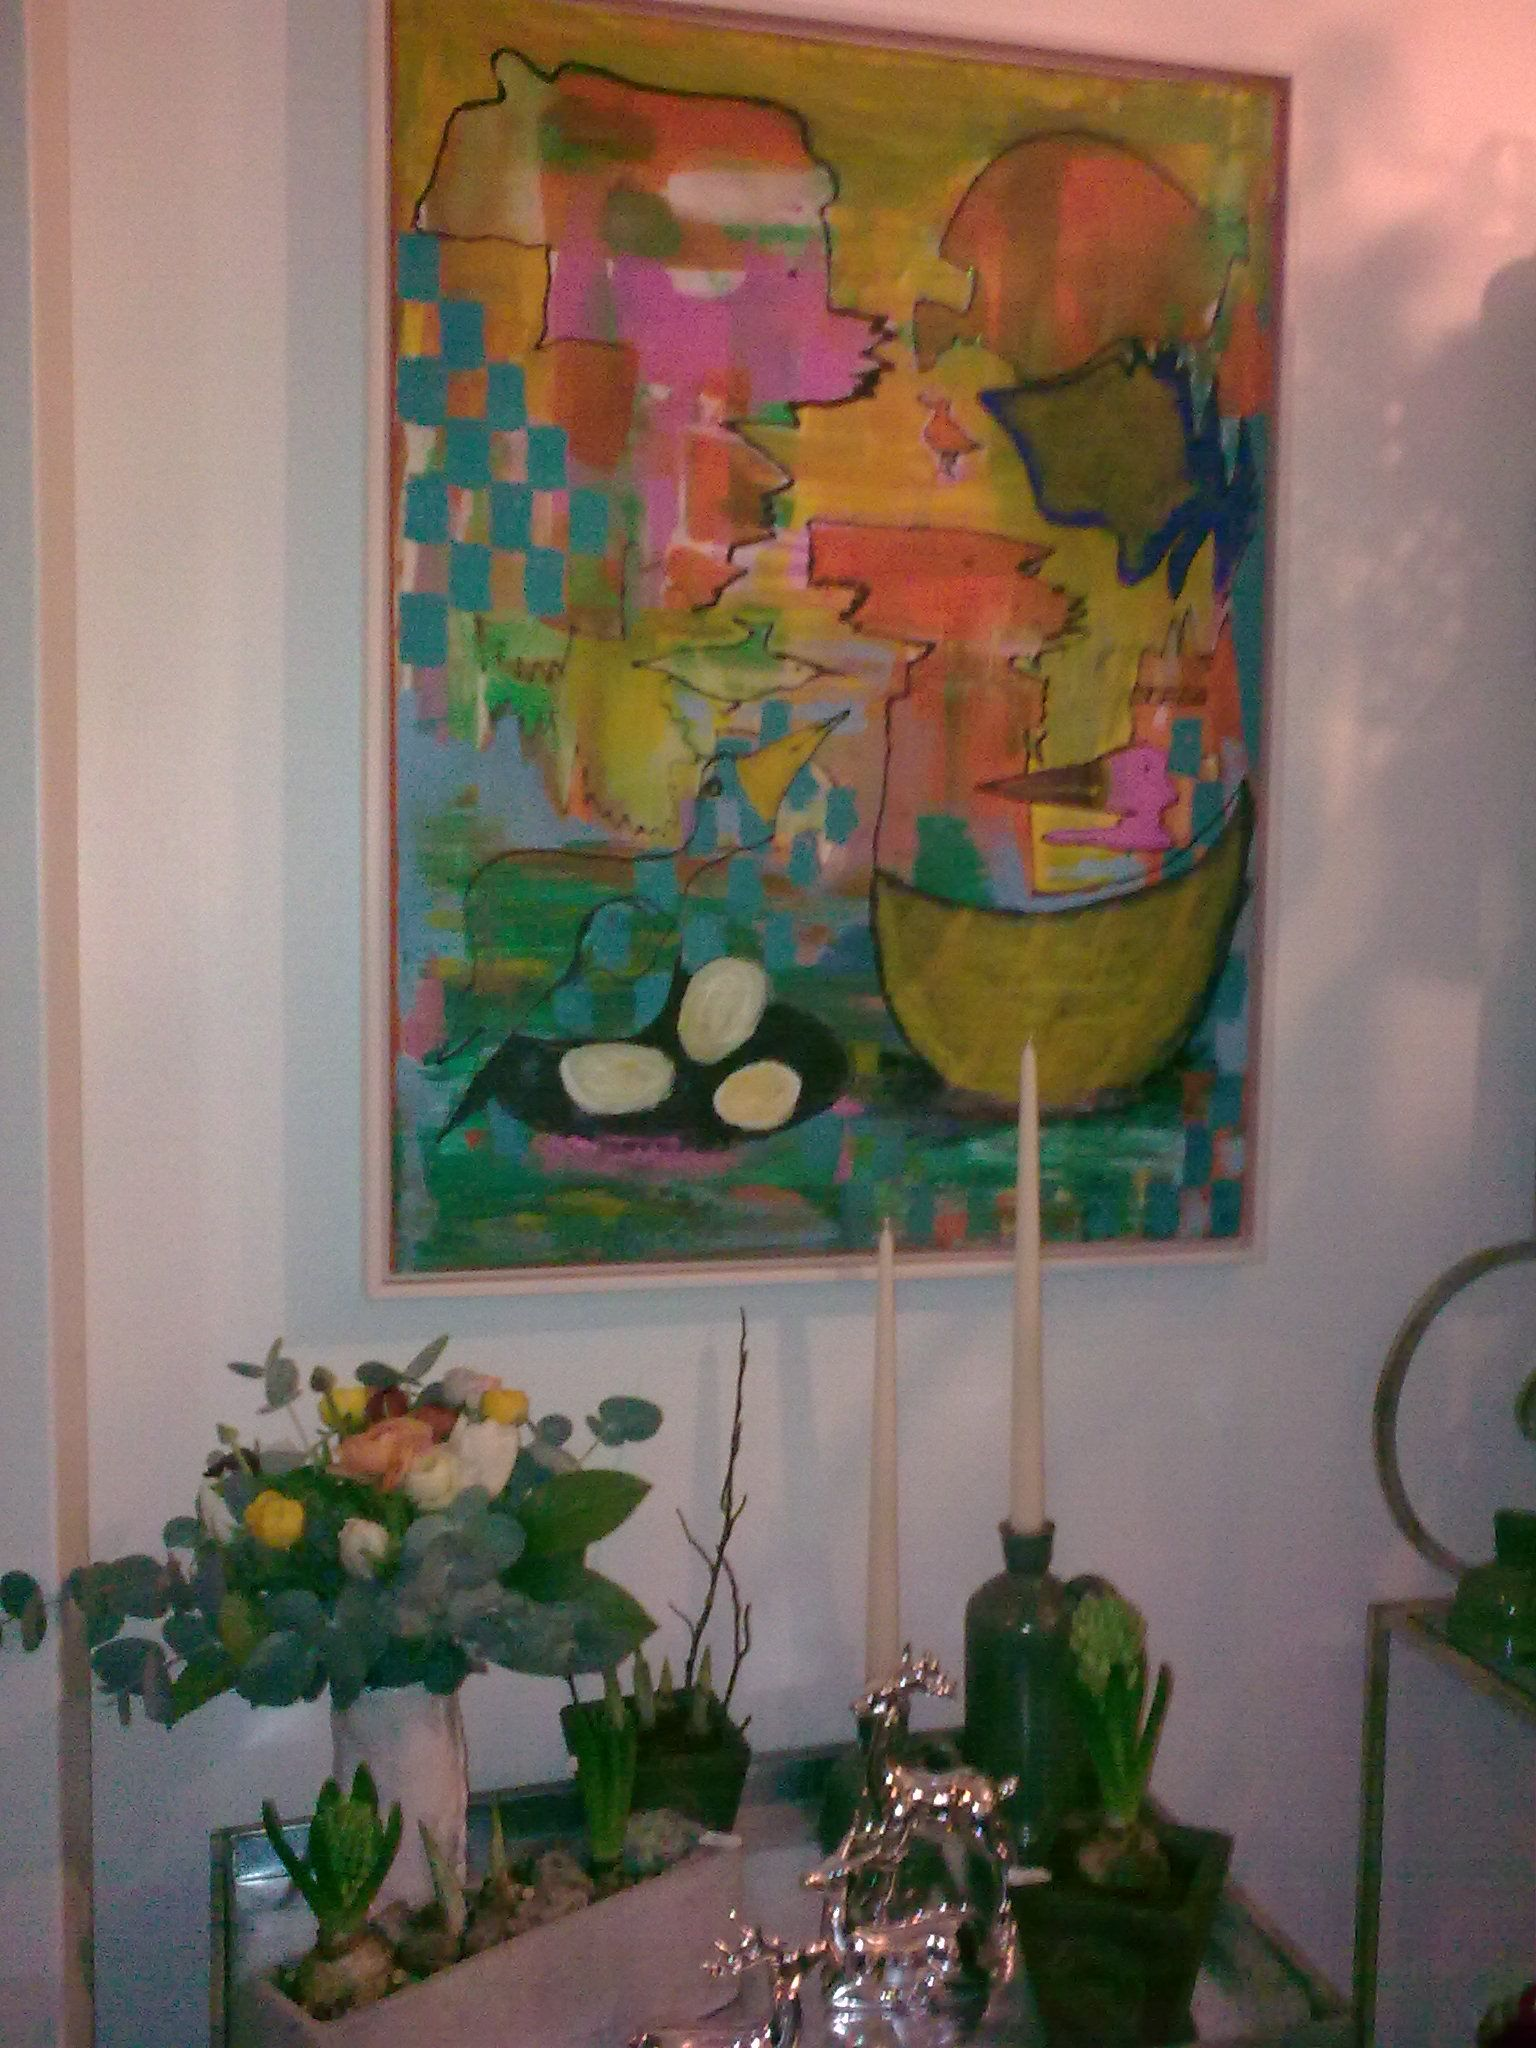 Pangfarver - Løgplanter, brugskunst og blomsterbuketter.